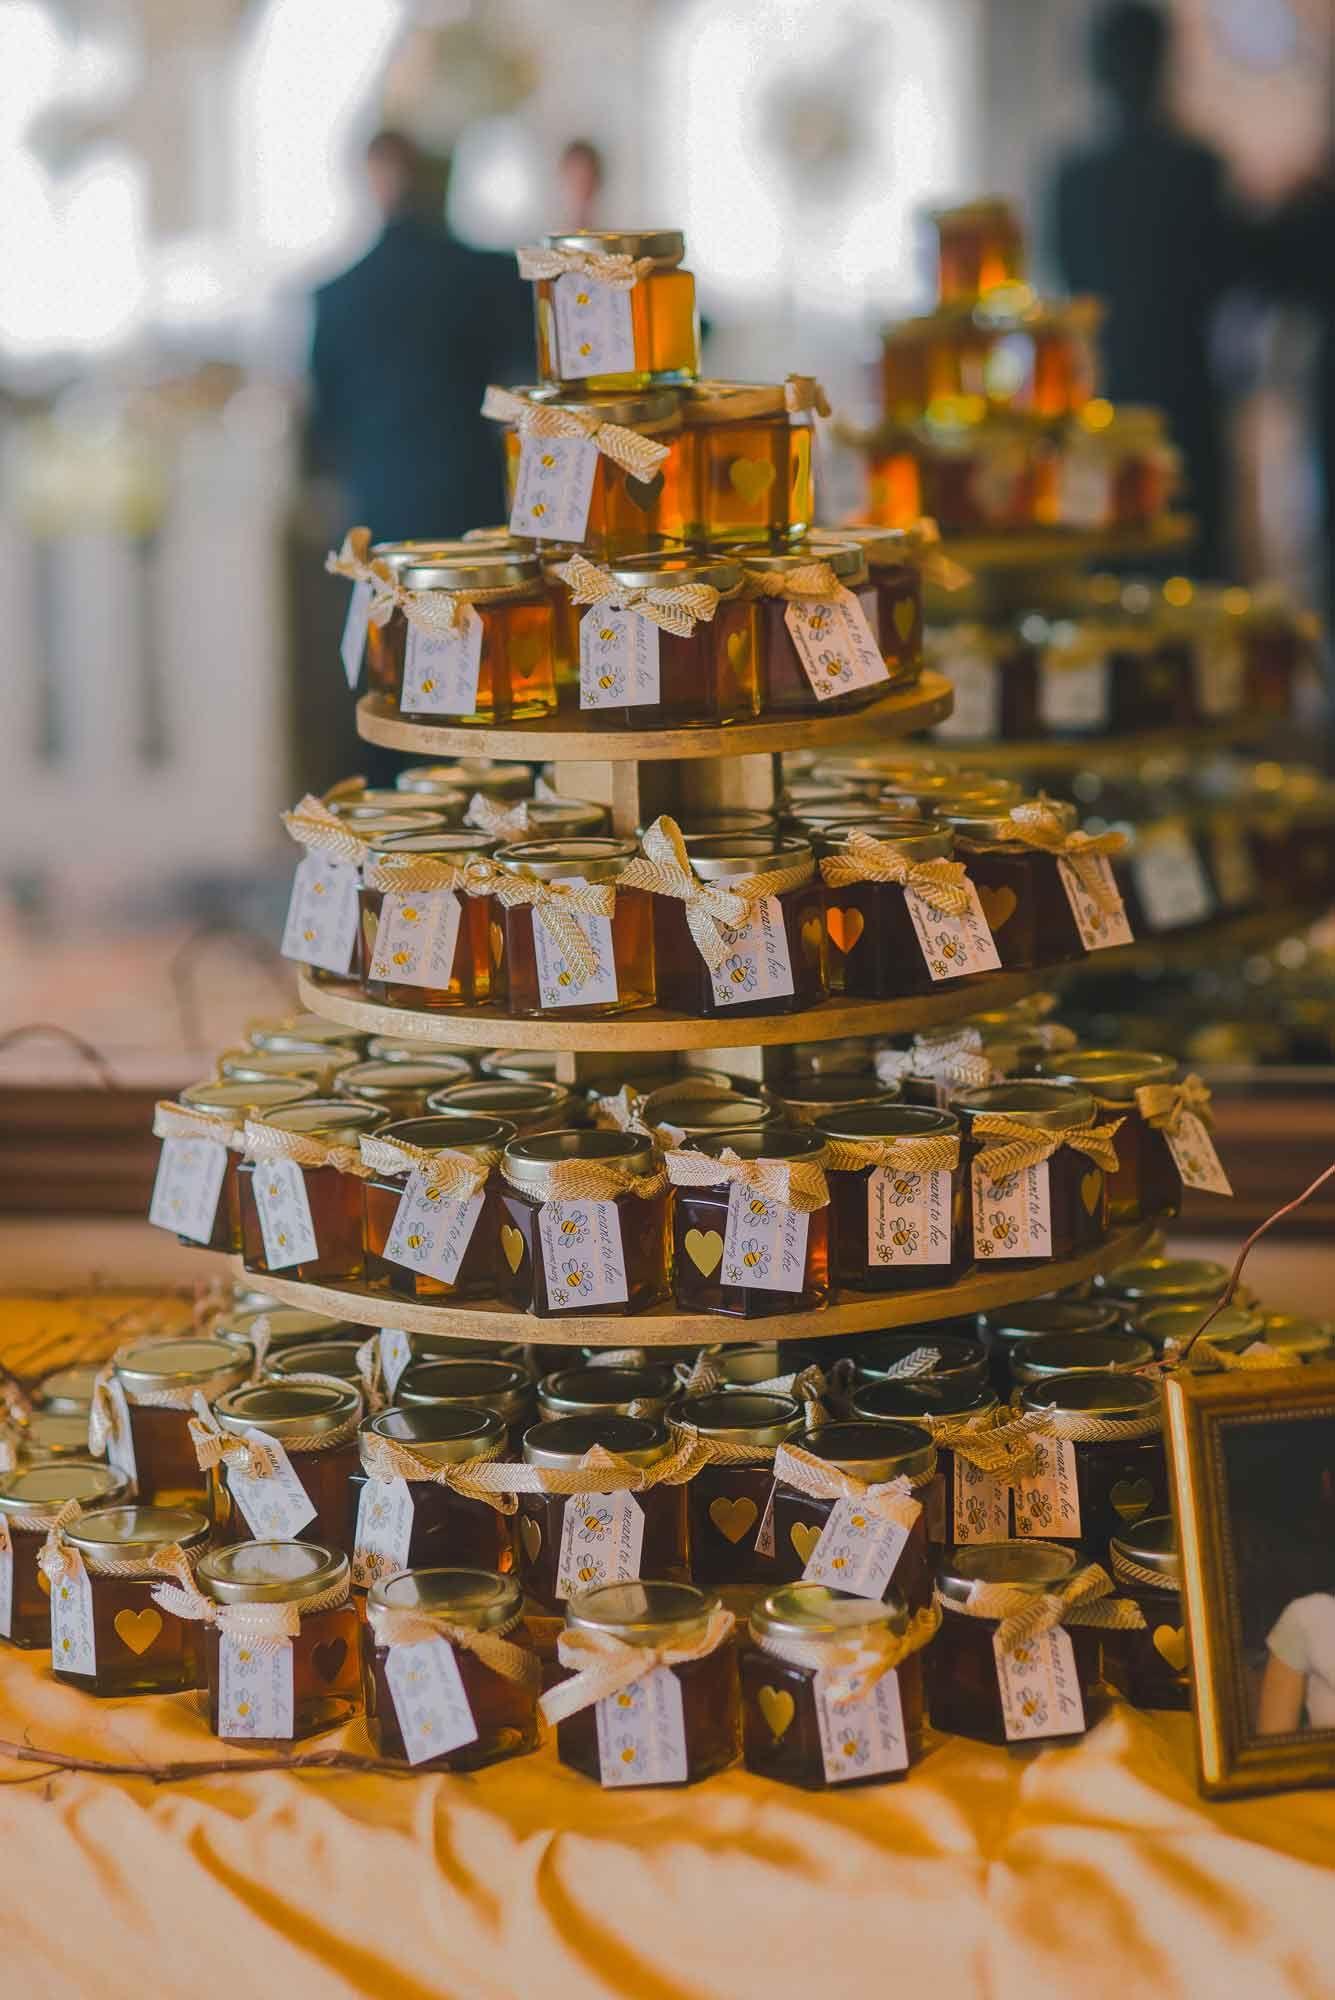 6oz honey wedding favors piled high in a terrific favor